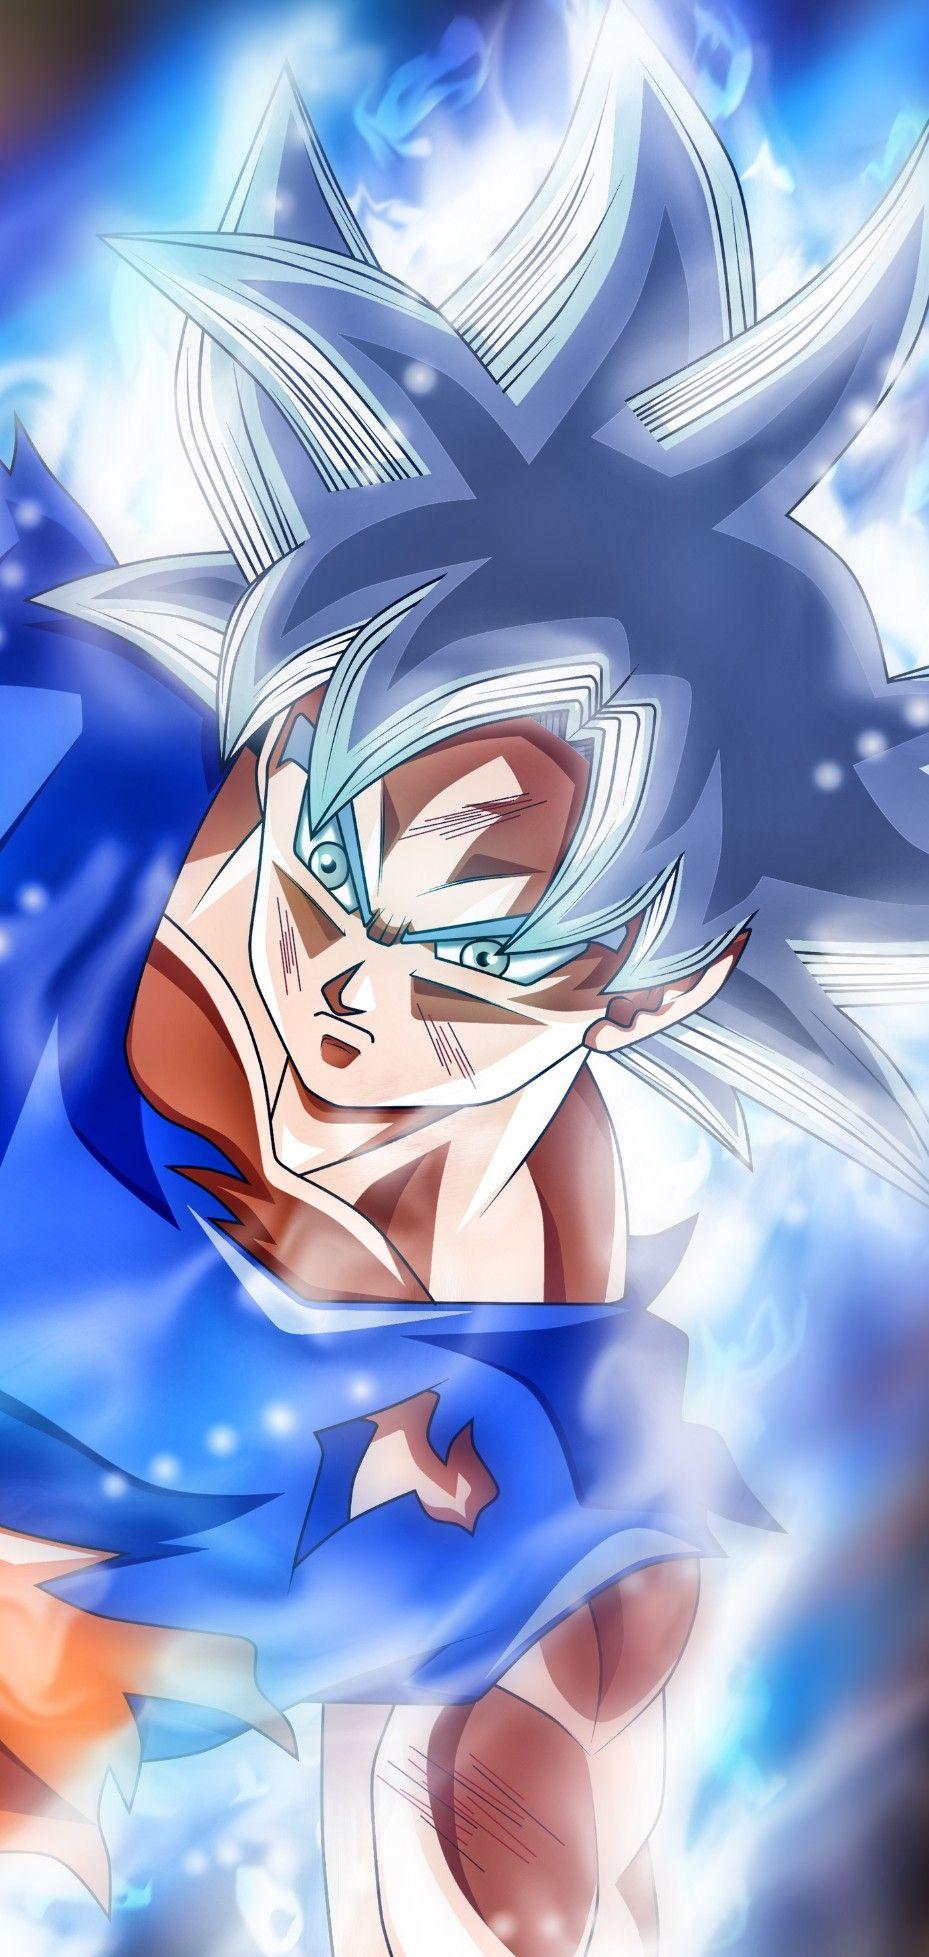 Goku Ultra Instinct Mastered Dragon Ball Super Anime Dragon Ball Super Goku Wallpaper Anime Dragon Ball